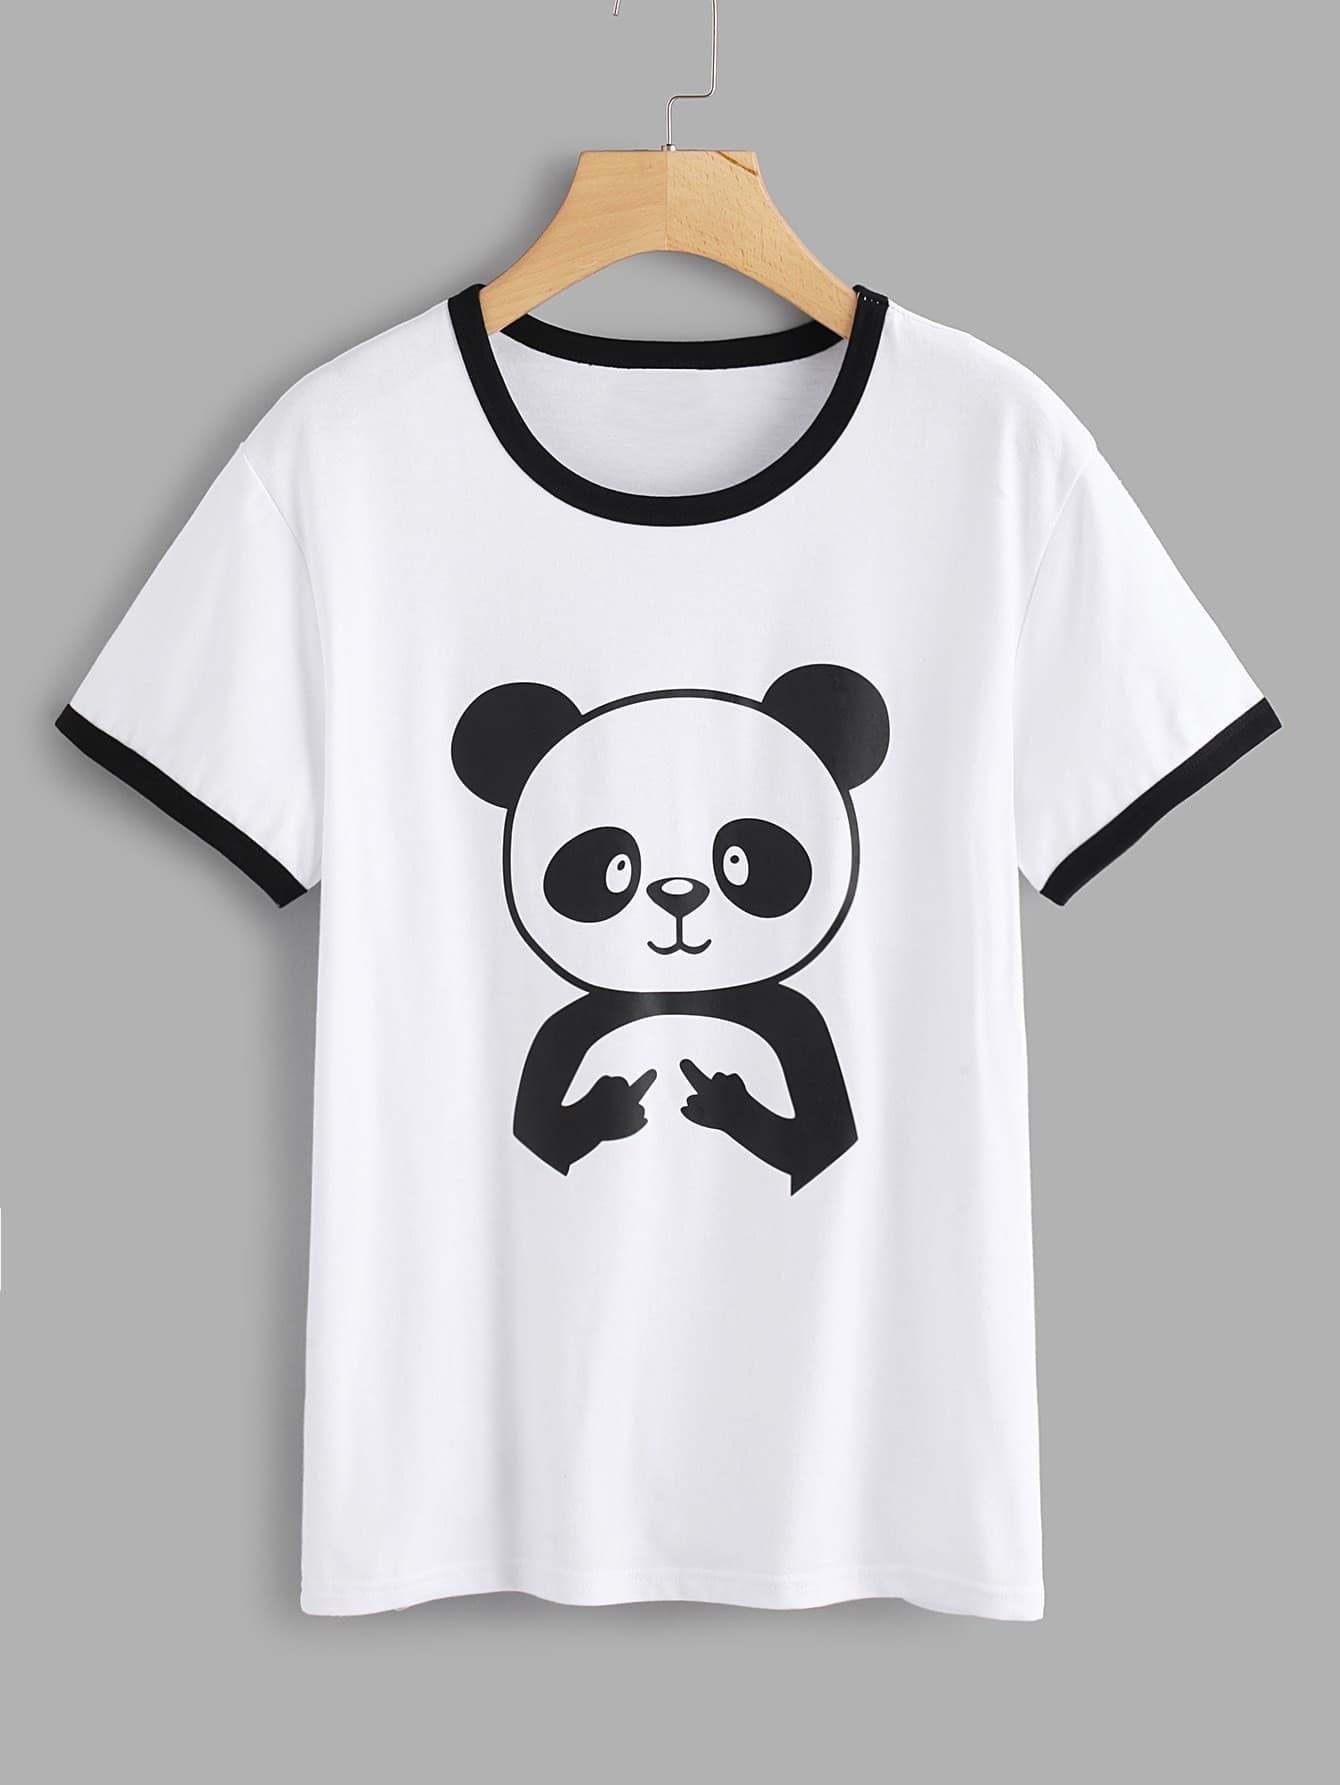 Contrast Trim Panda Print Tee contrast striped trim camo print tee